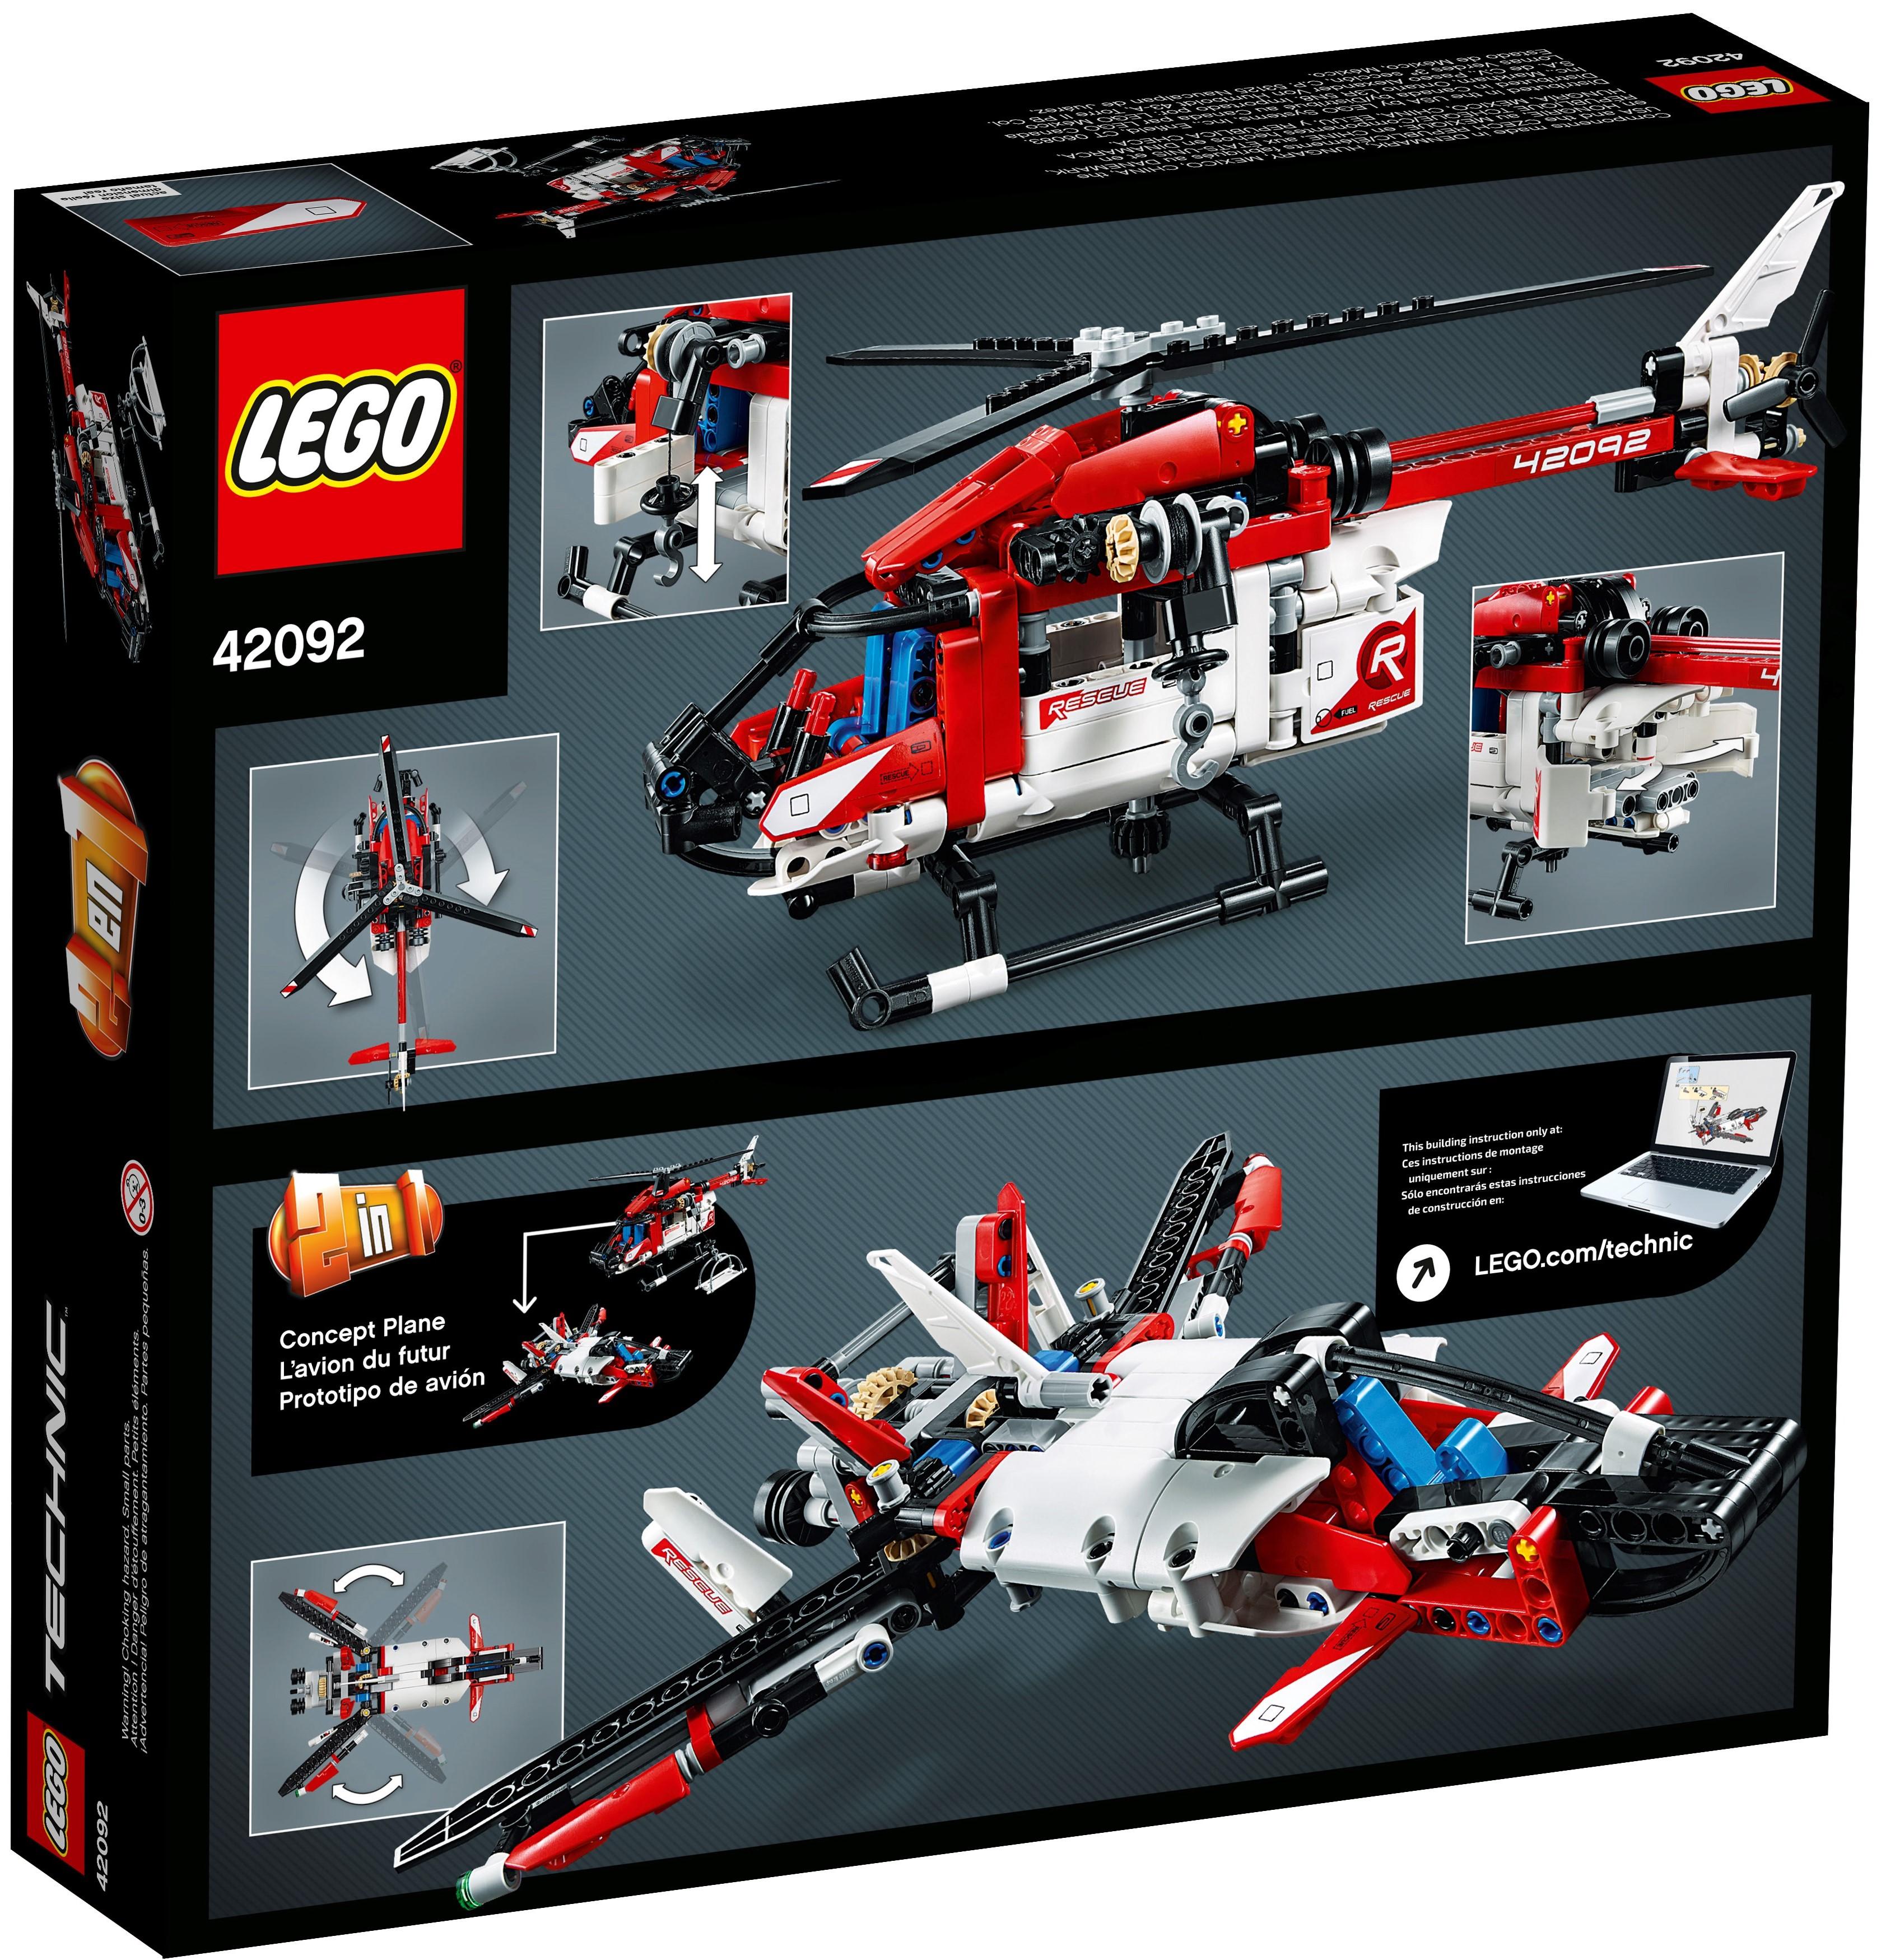 LEGO Technic 42092 Räddningshelikopter